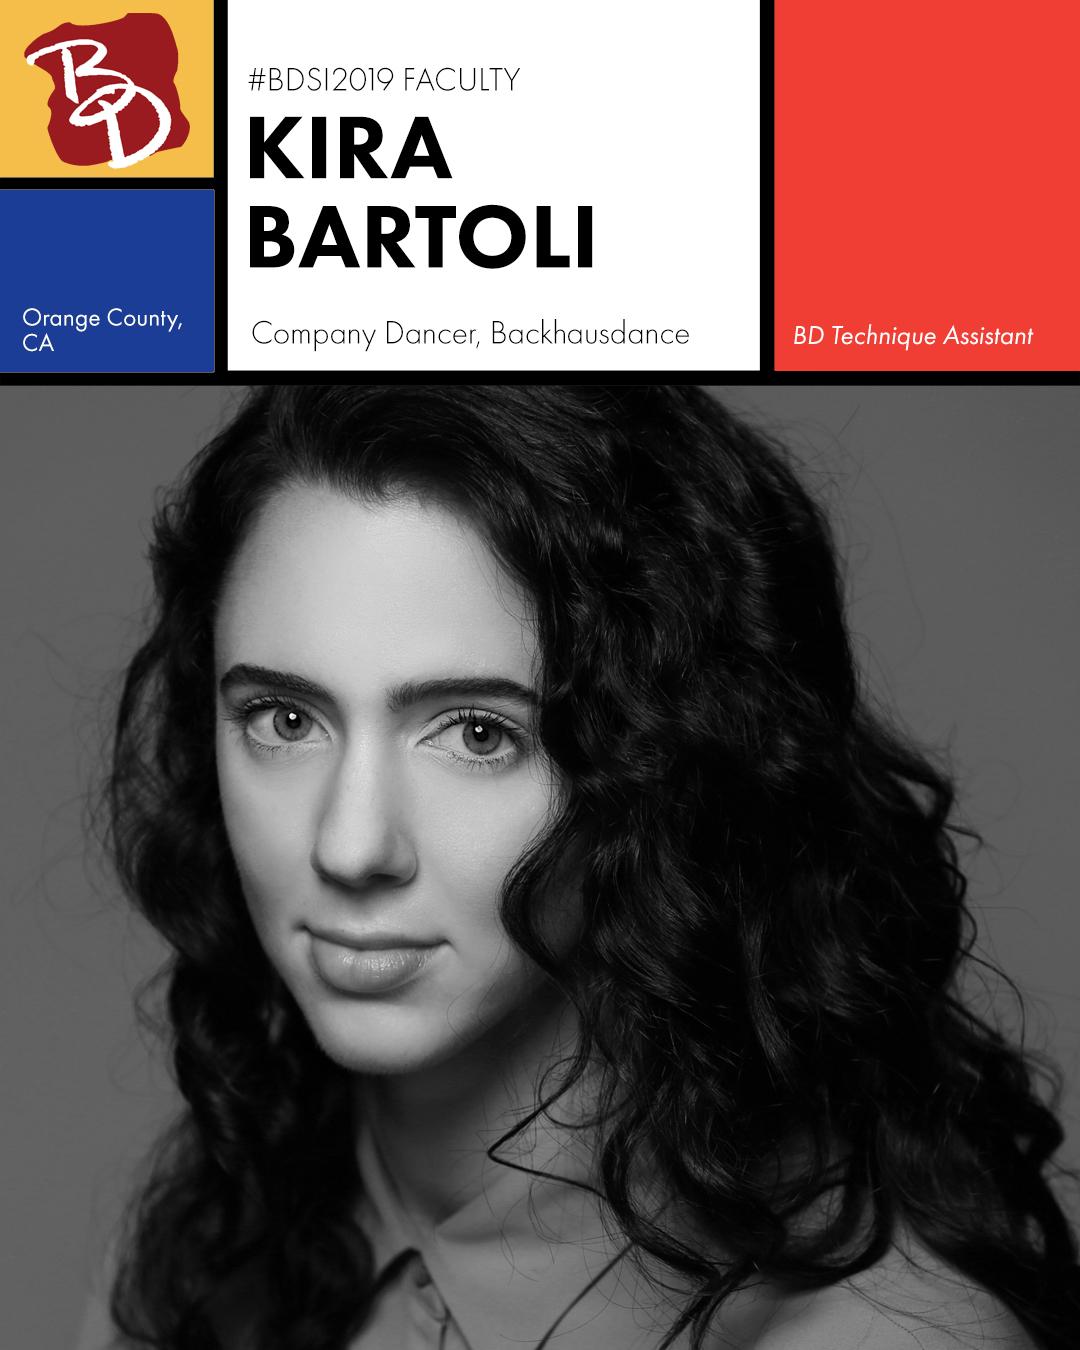 Faculty Announcement - Bartoli Kira.jpg